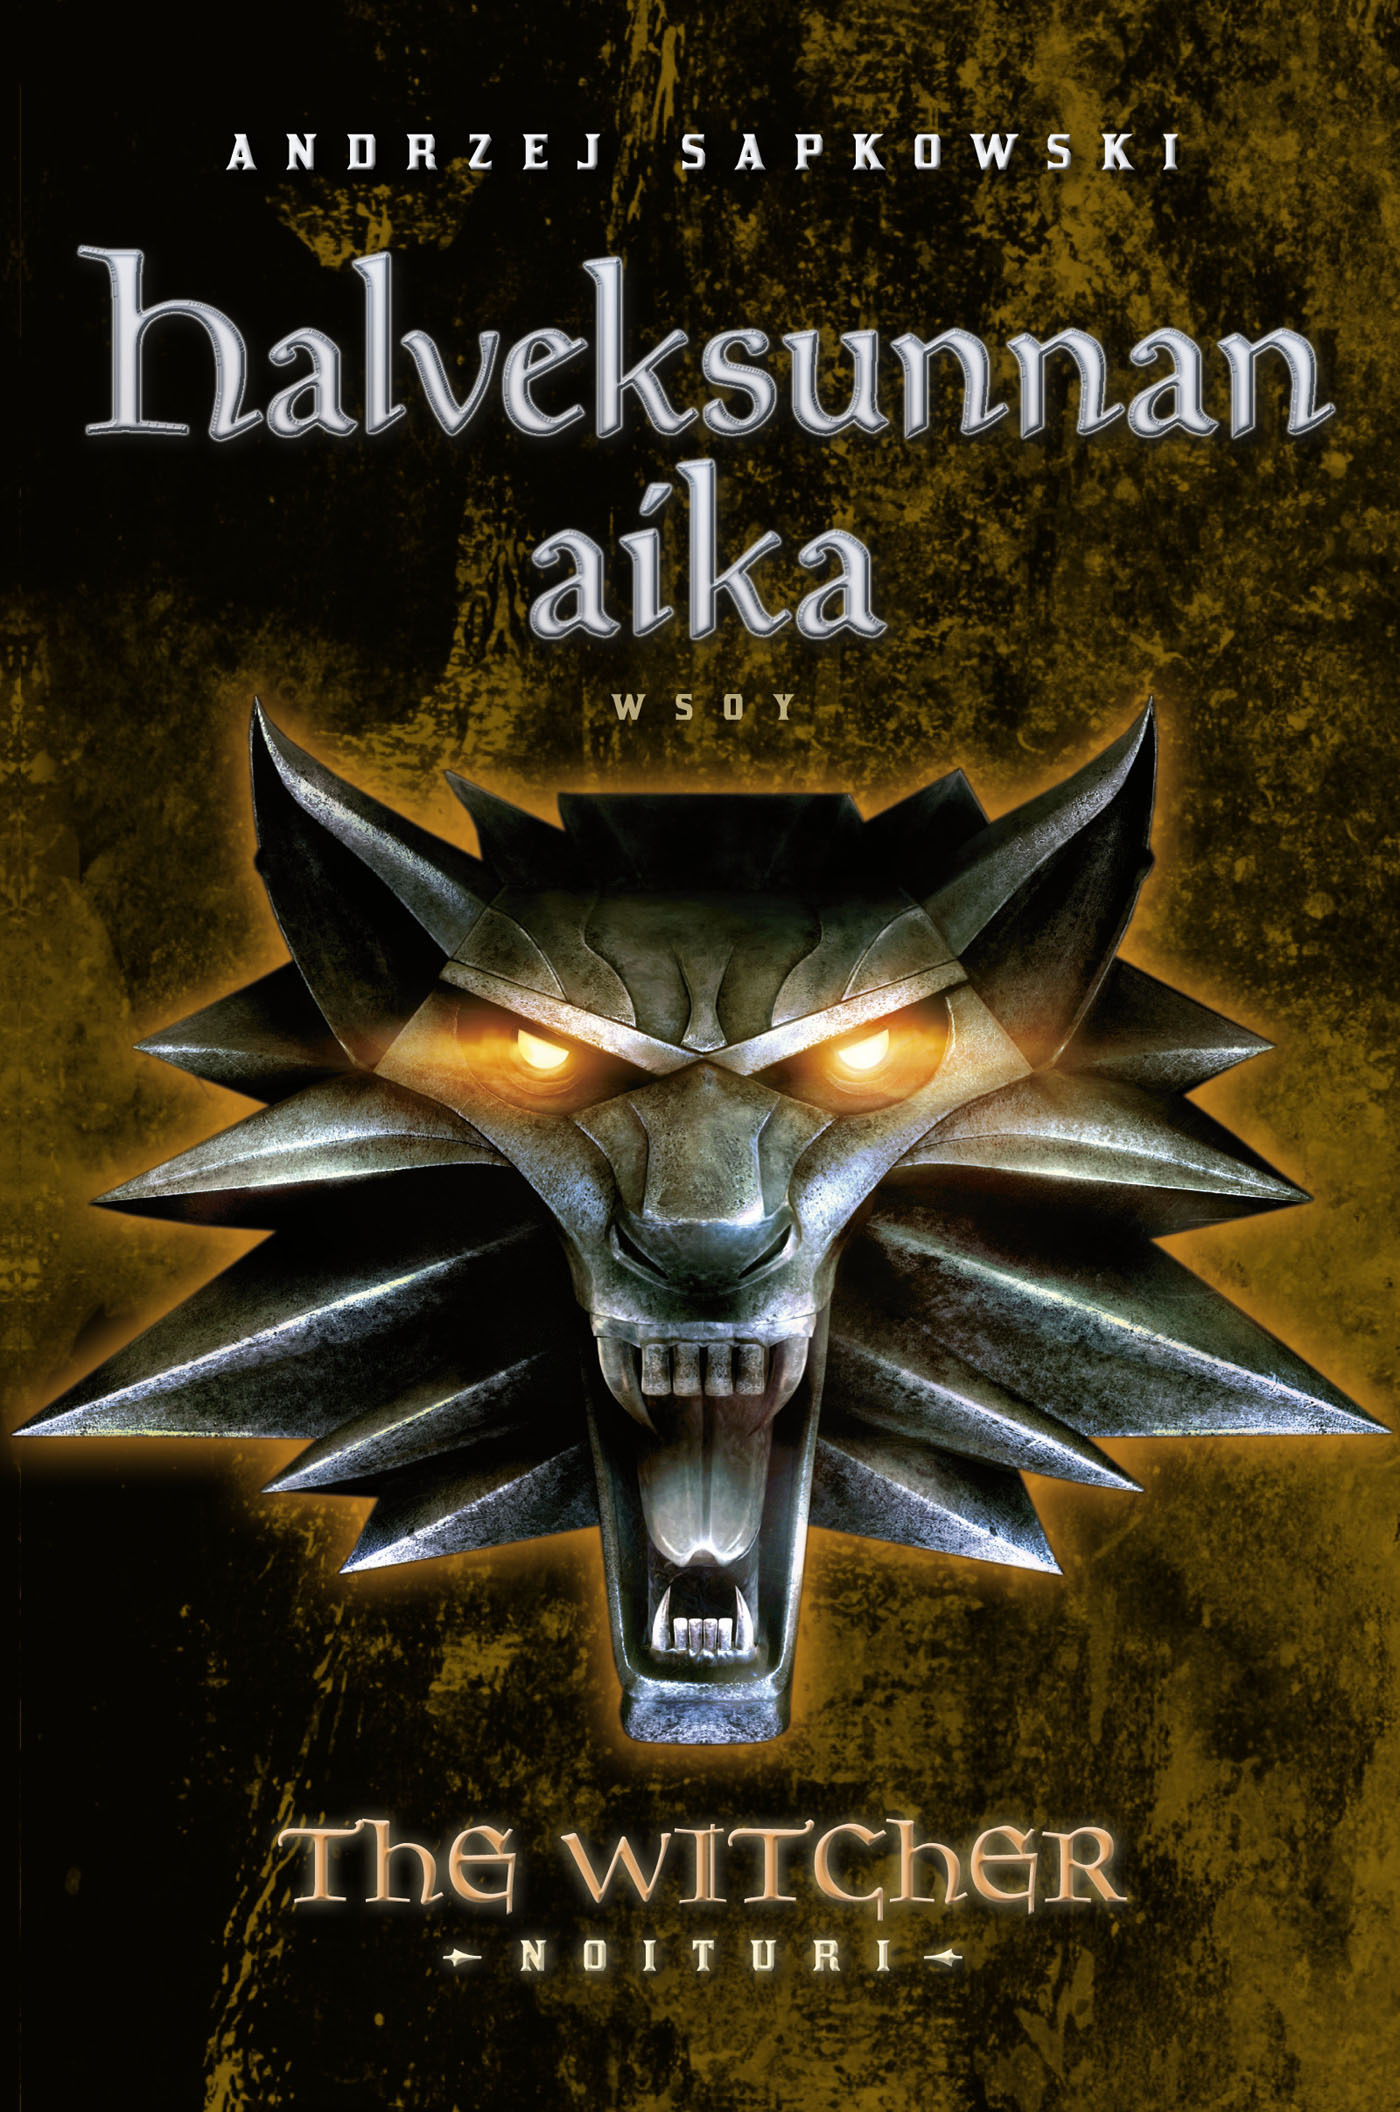 Sapkowski, Andrzej - Halveksunnan aika: The Witcher - Noituri 4, e-bok